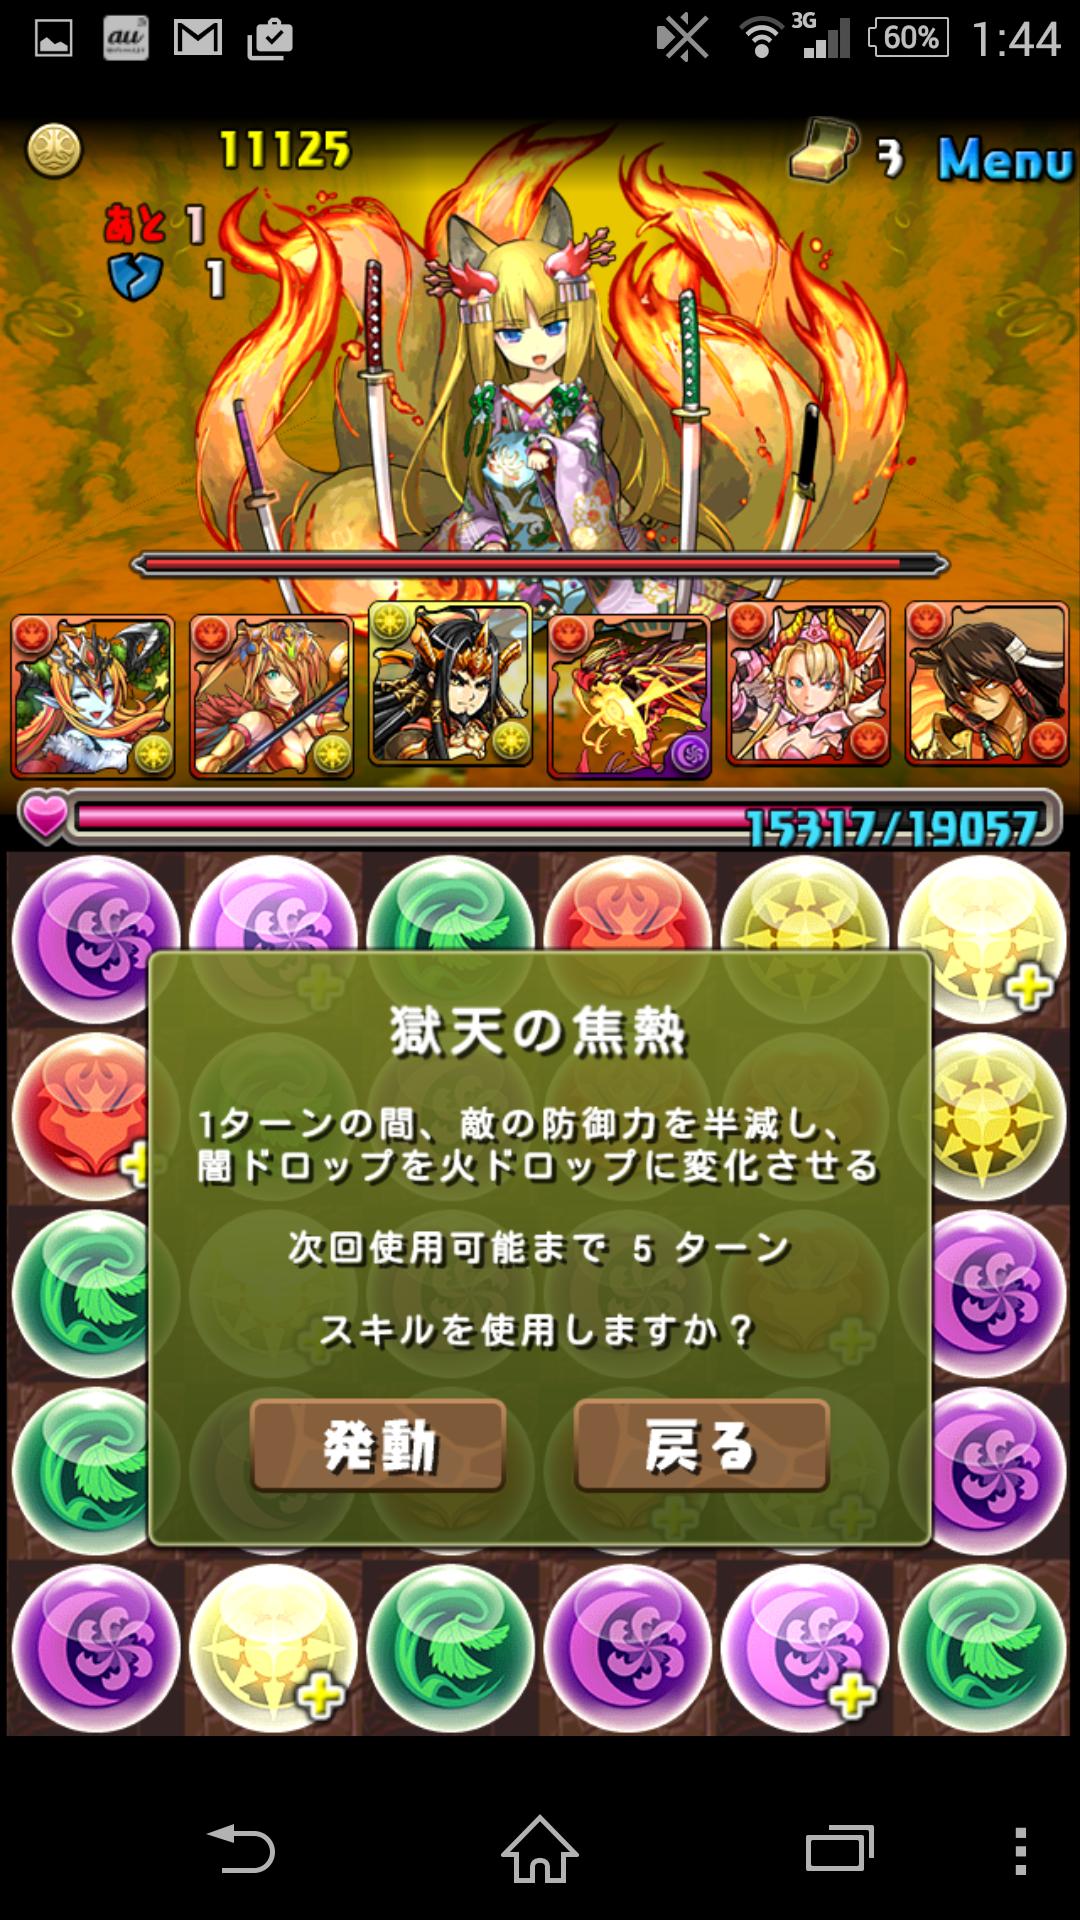 Screenshot_2015-01-20-01-44-25.png